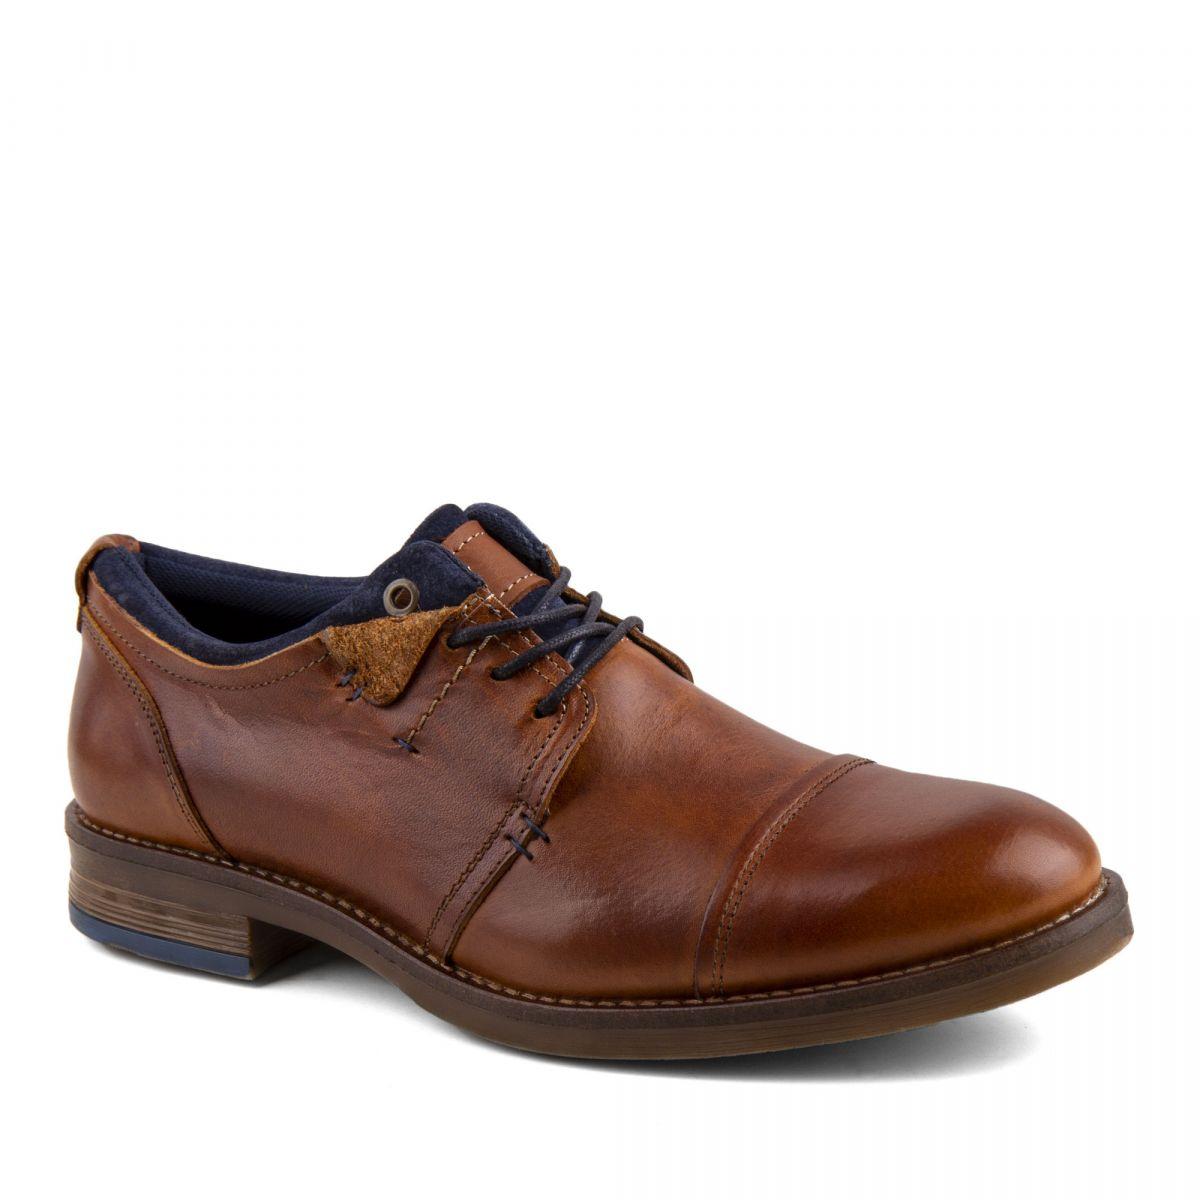 chaussures de ville cuir marron homme orlando prix. Black Bedroom Furniture Sets. Home Design Ideas